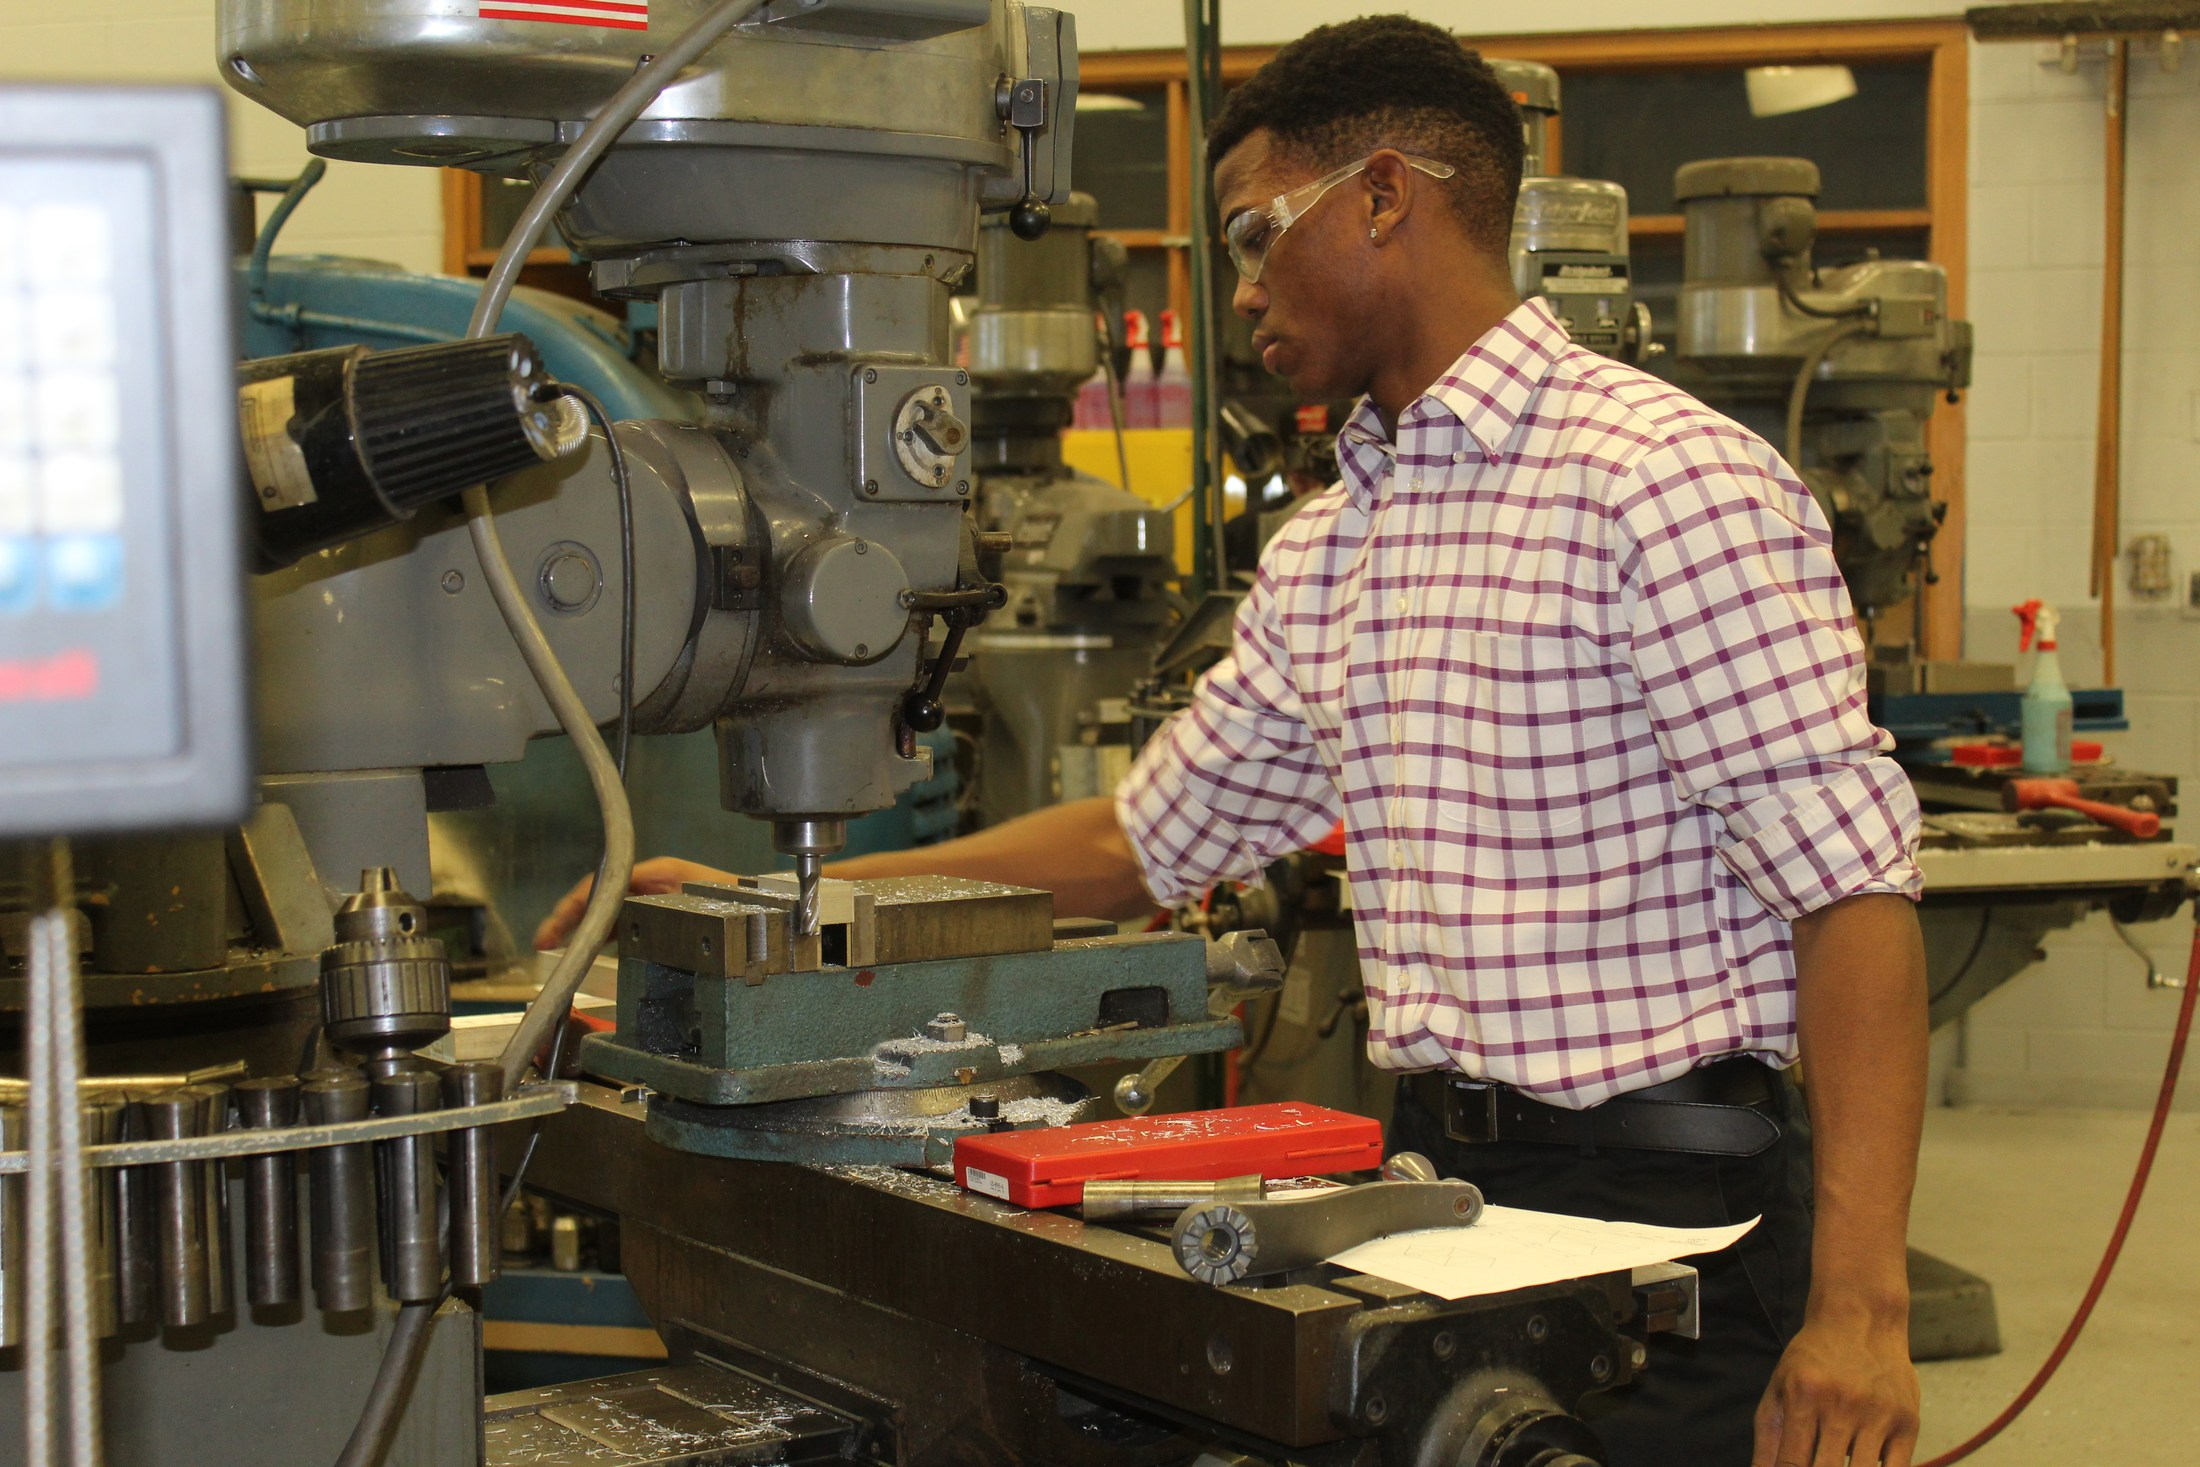 machine tool class student hard at work